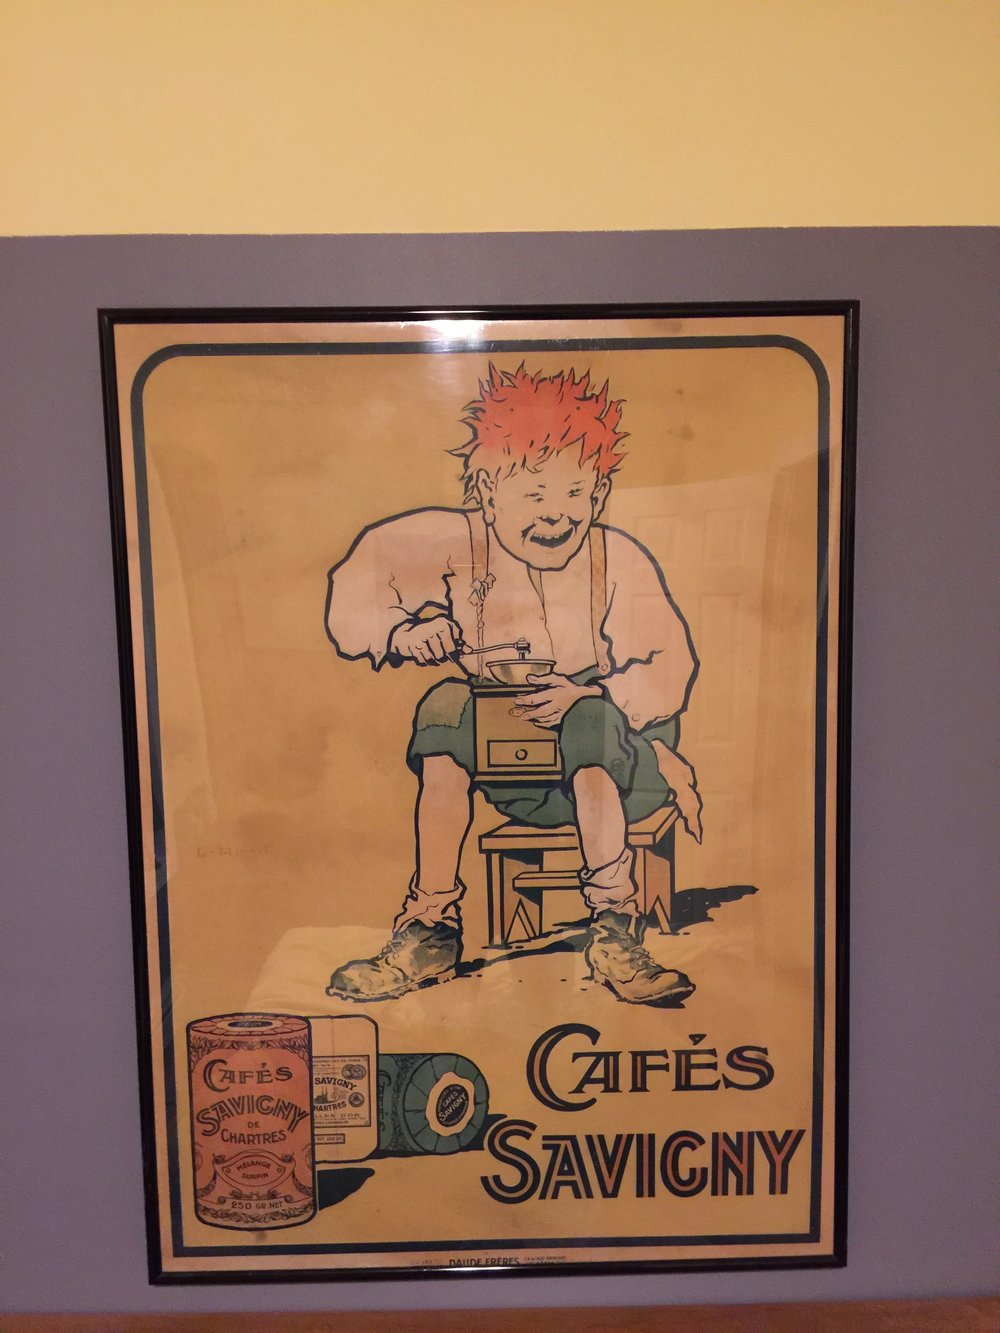 Georges Ripart - 'Cafés Savigny' Chromolithograph